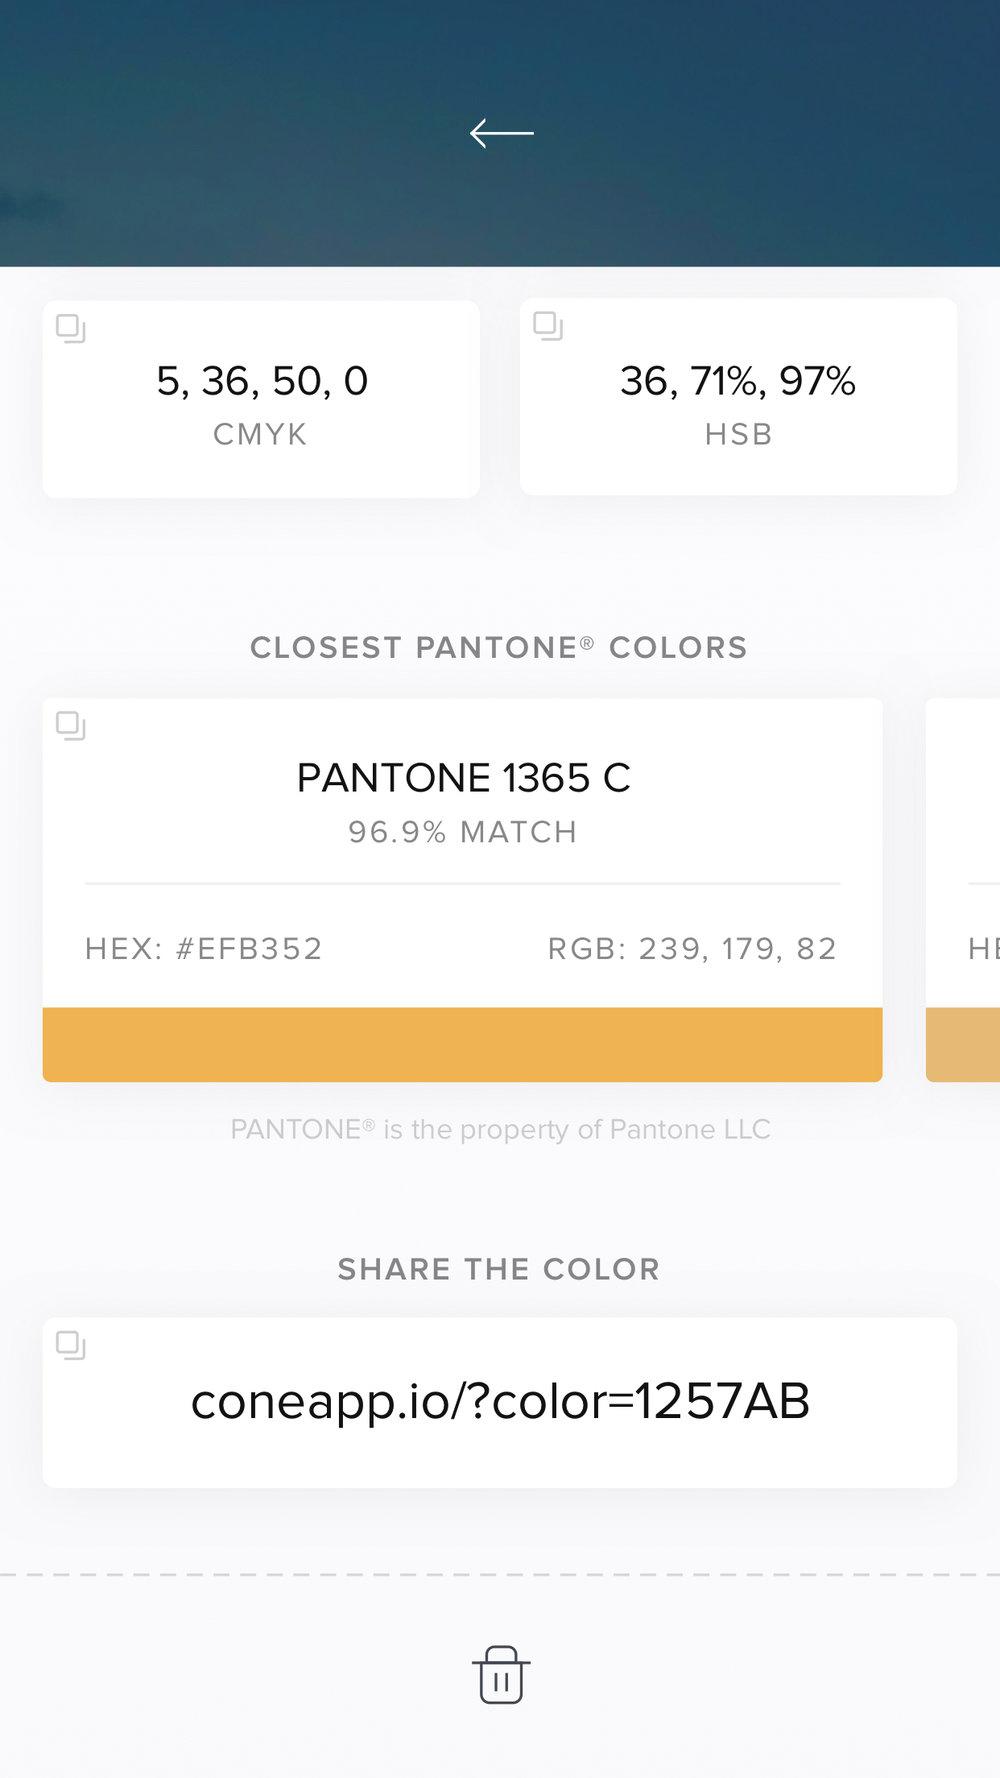 Closest Pantone Colors.jpg